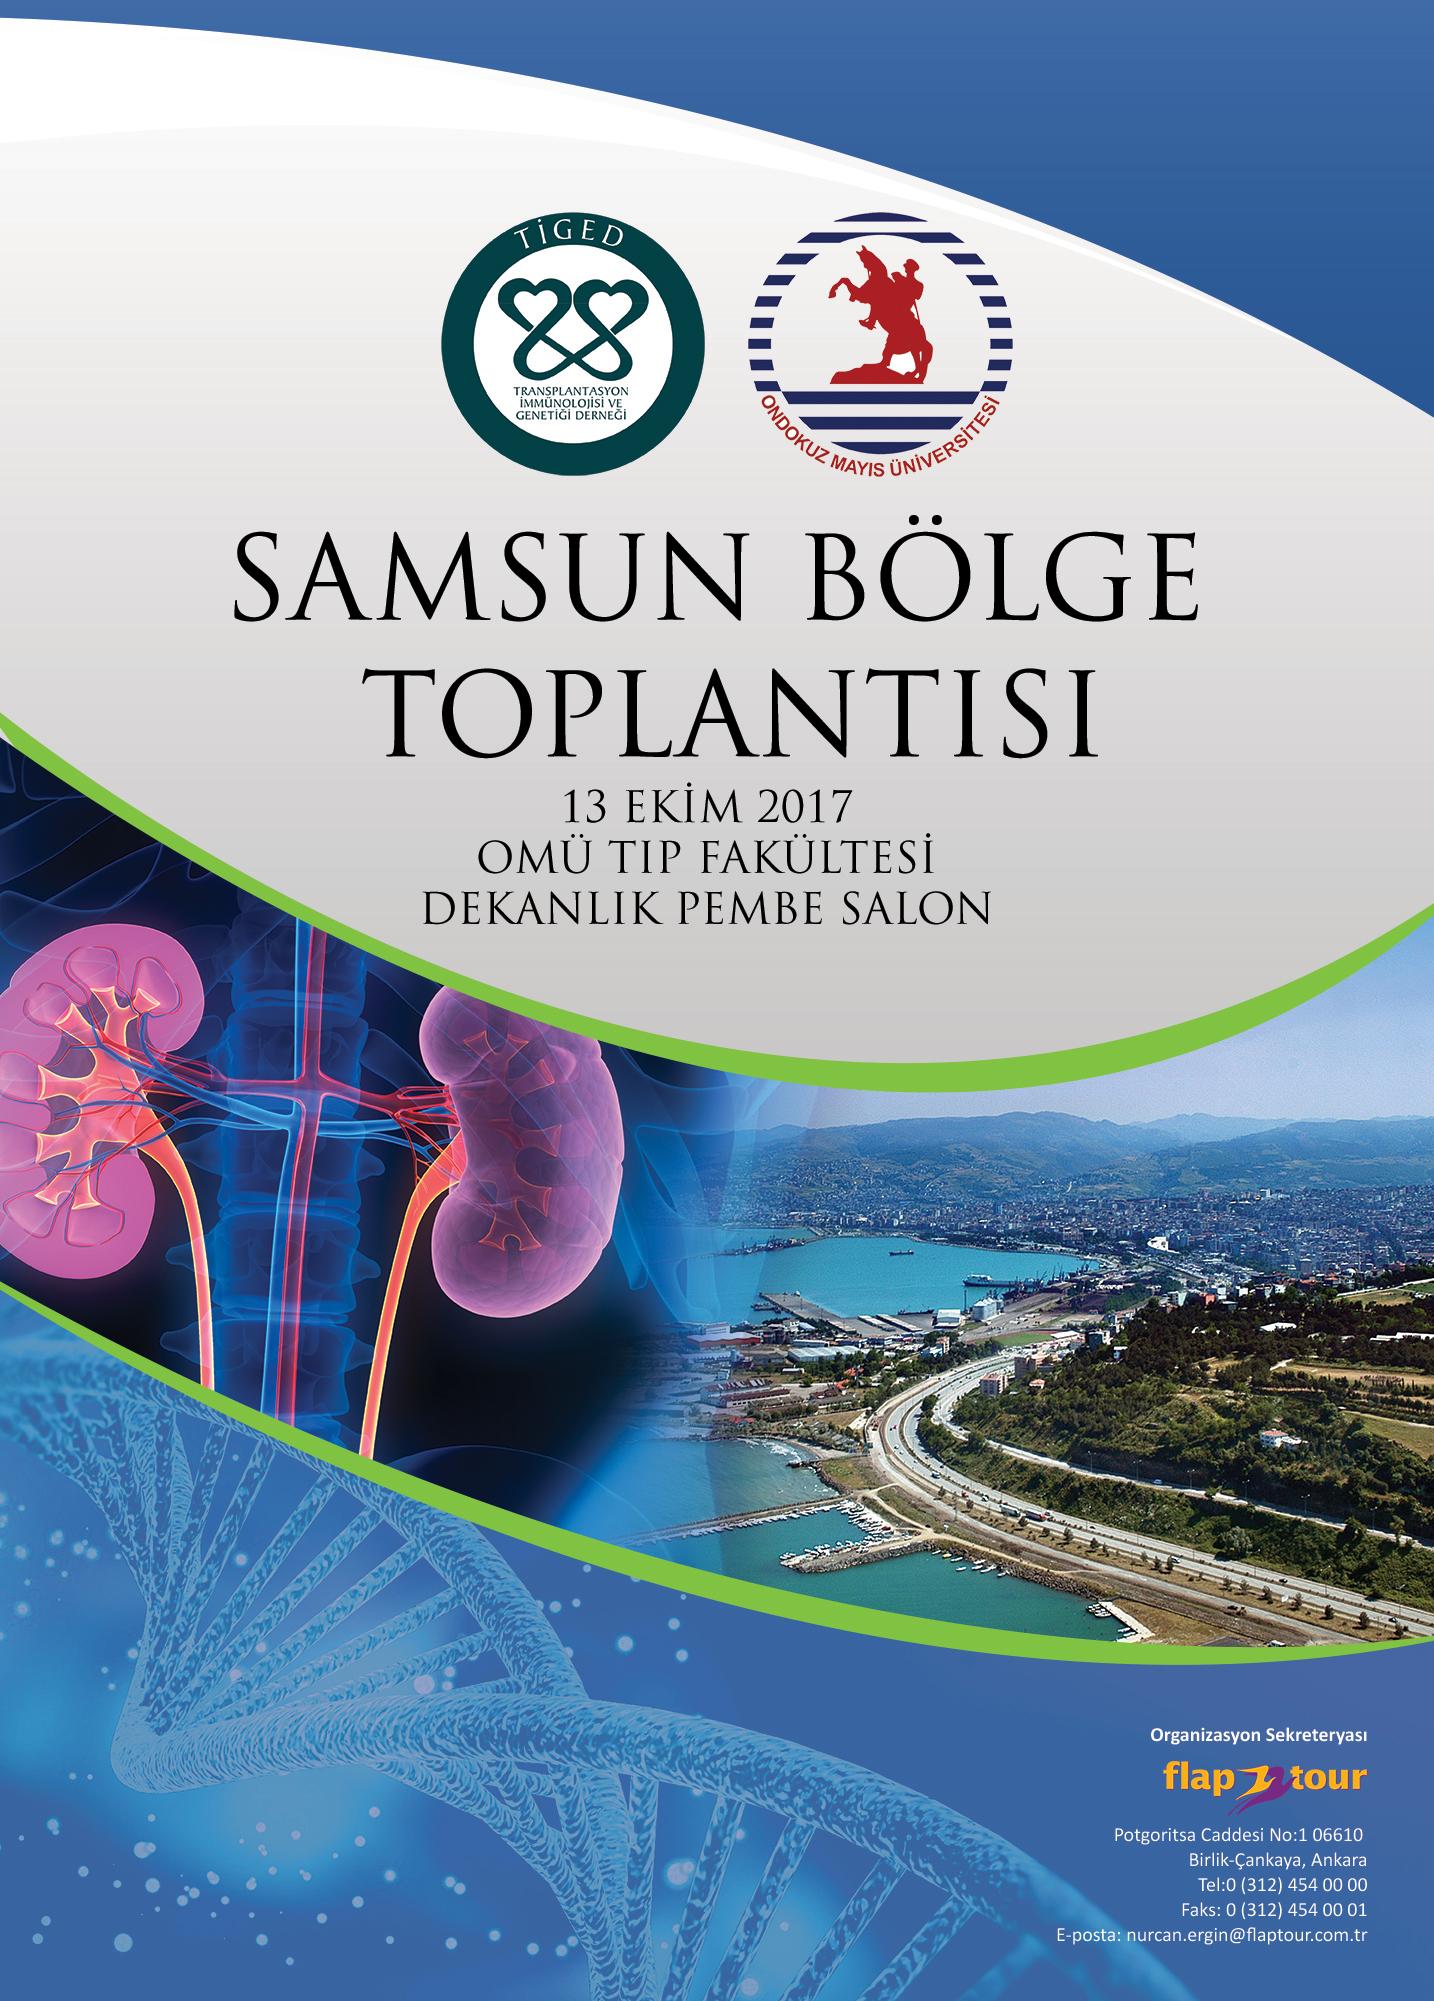 http://www.omu.edu.tr/sites/default/files/files/transplantasyon_immunaloji_samsun_bolge_toplantisi/omu-tip-samsun-bplge-topposter2web.jpg